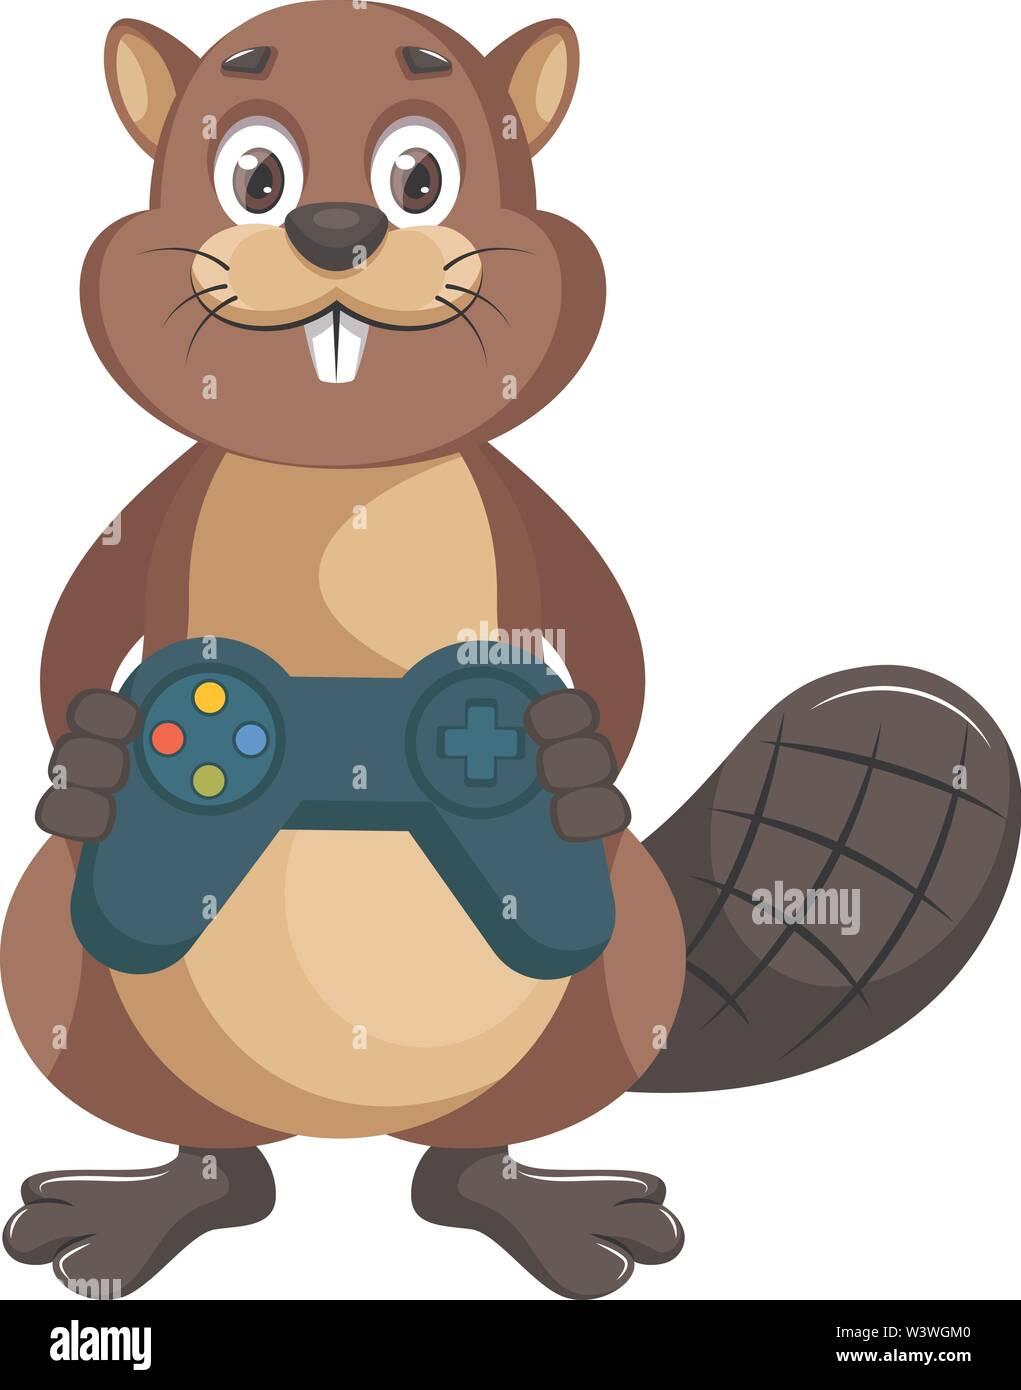 Beaver with gamepad, illustration, vector on white background. - Stock Image